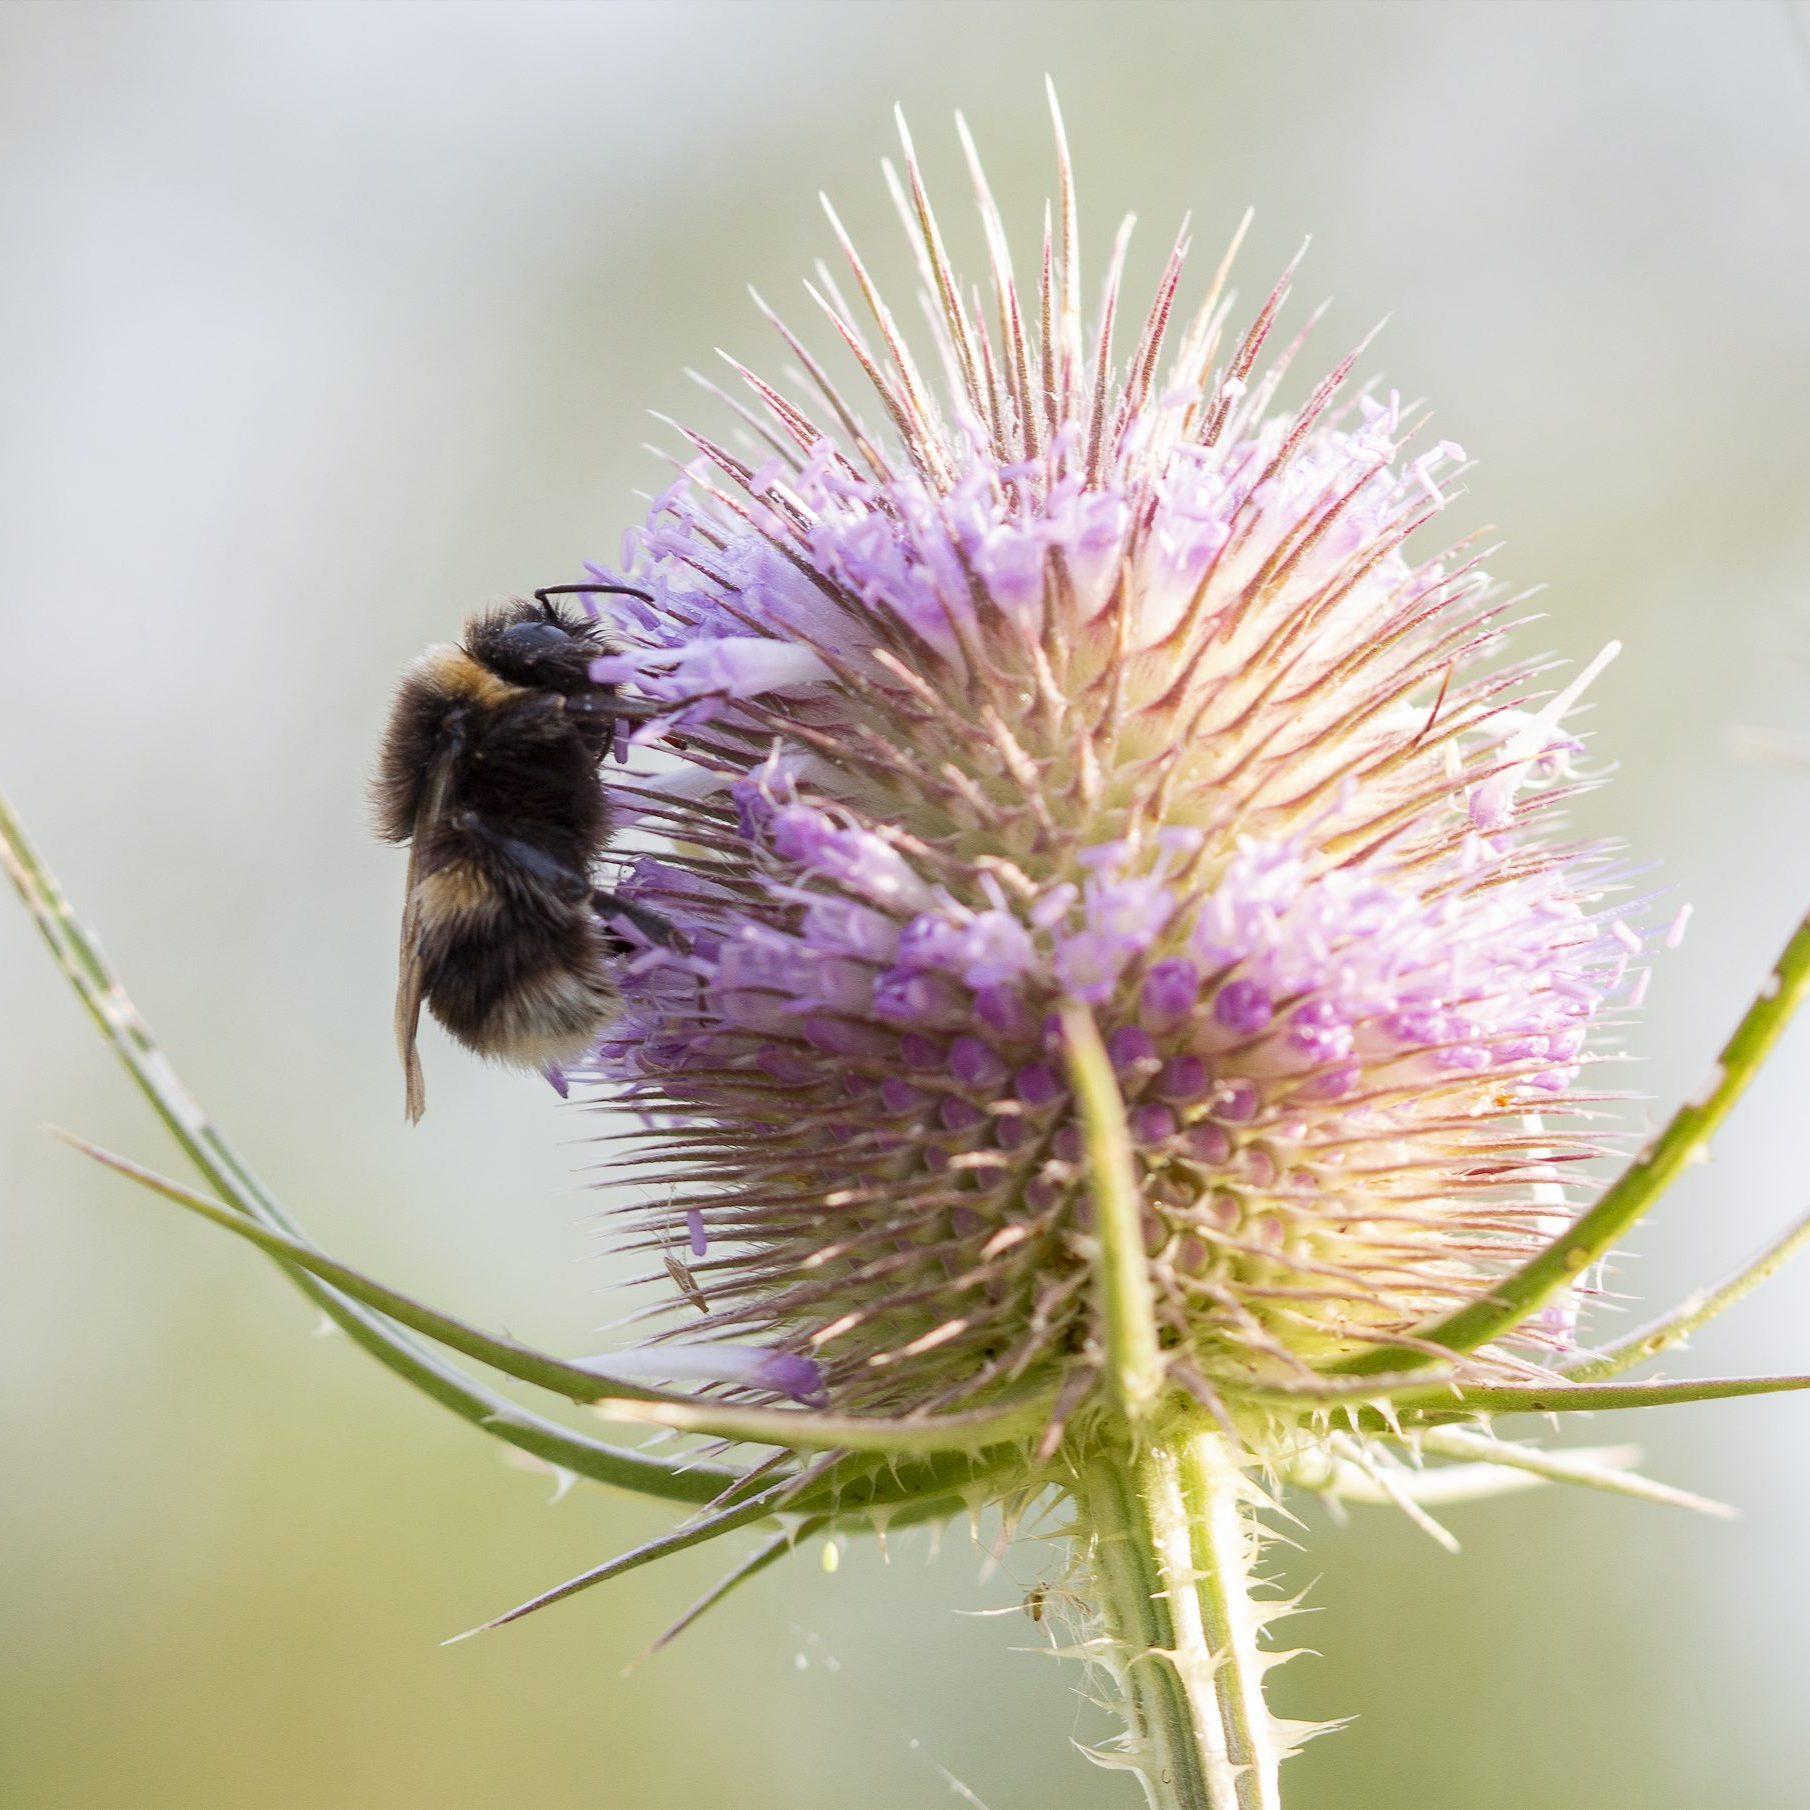 Bees, Wasps, & Flies